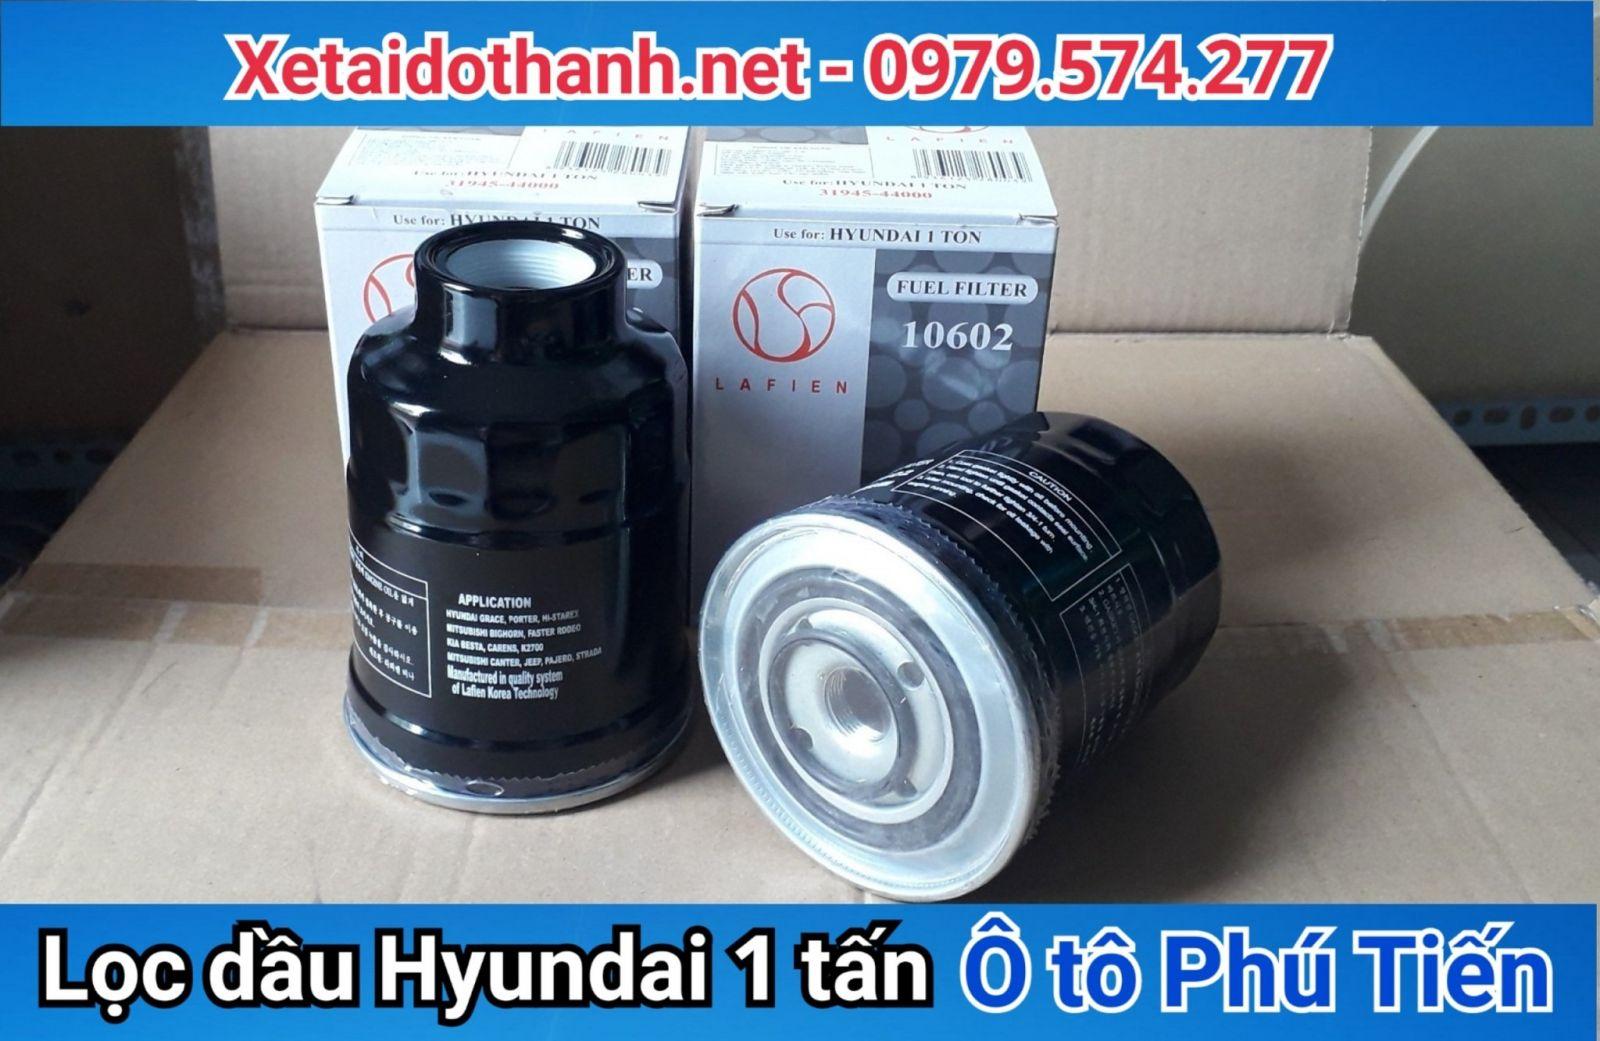 Lọc dầu Hyundai 1 tấn